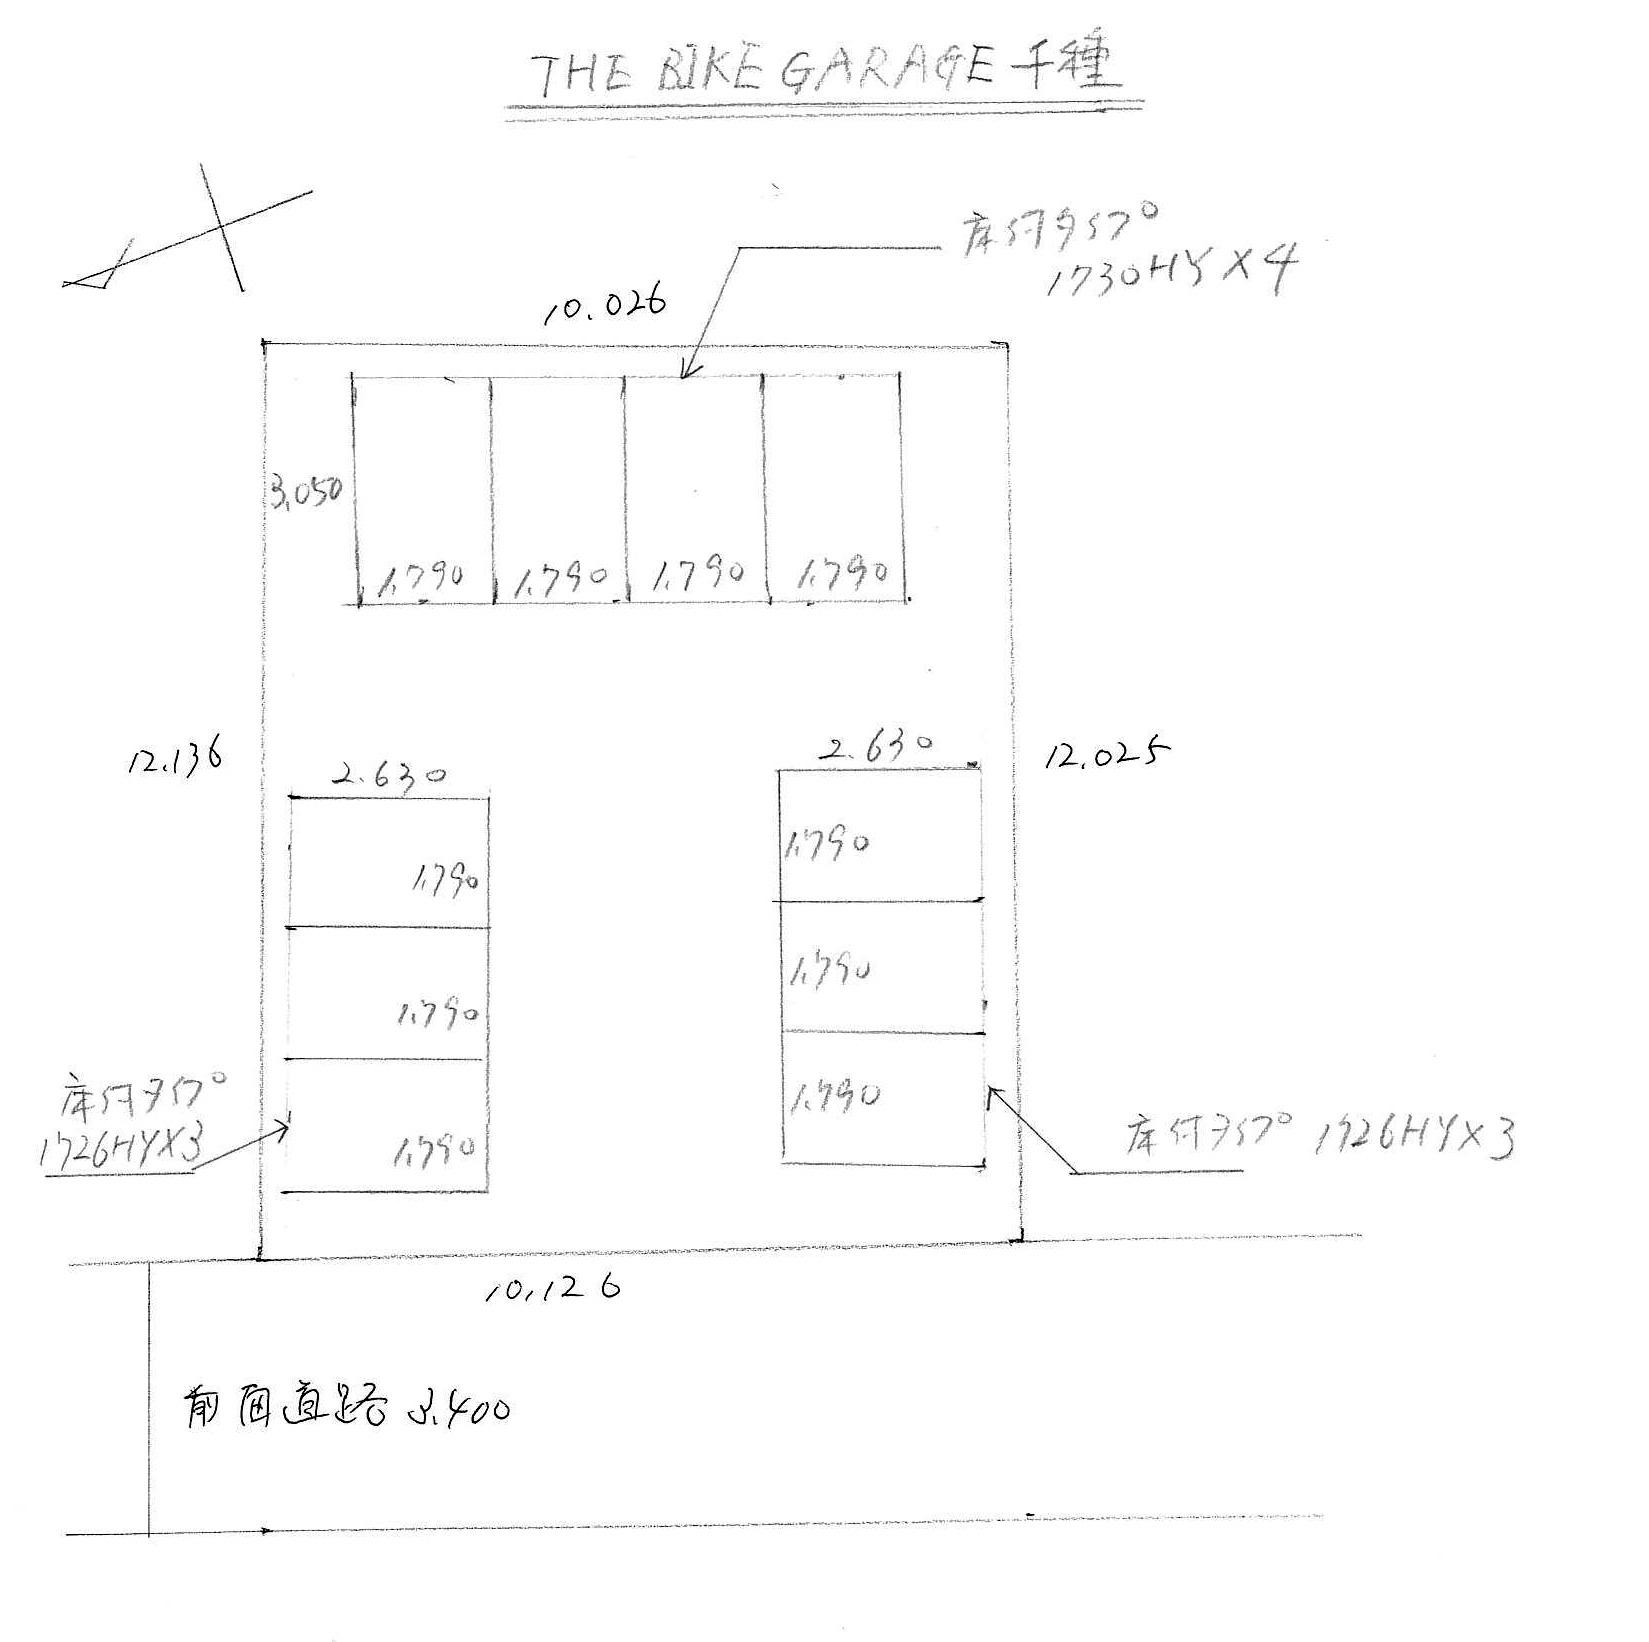 THE-BIKE-GARAGE-千種_敷地配置図